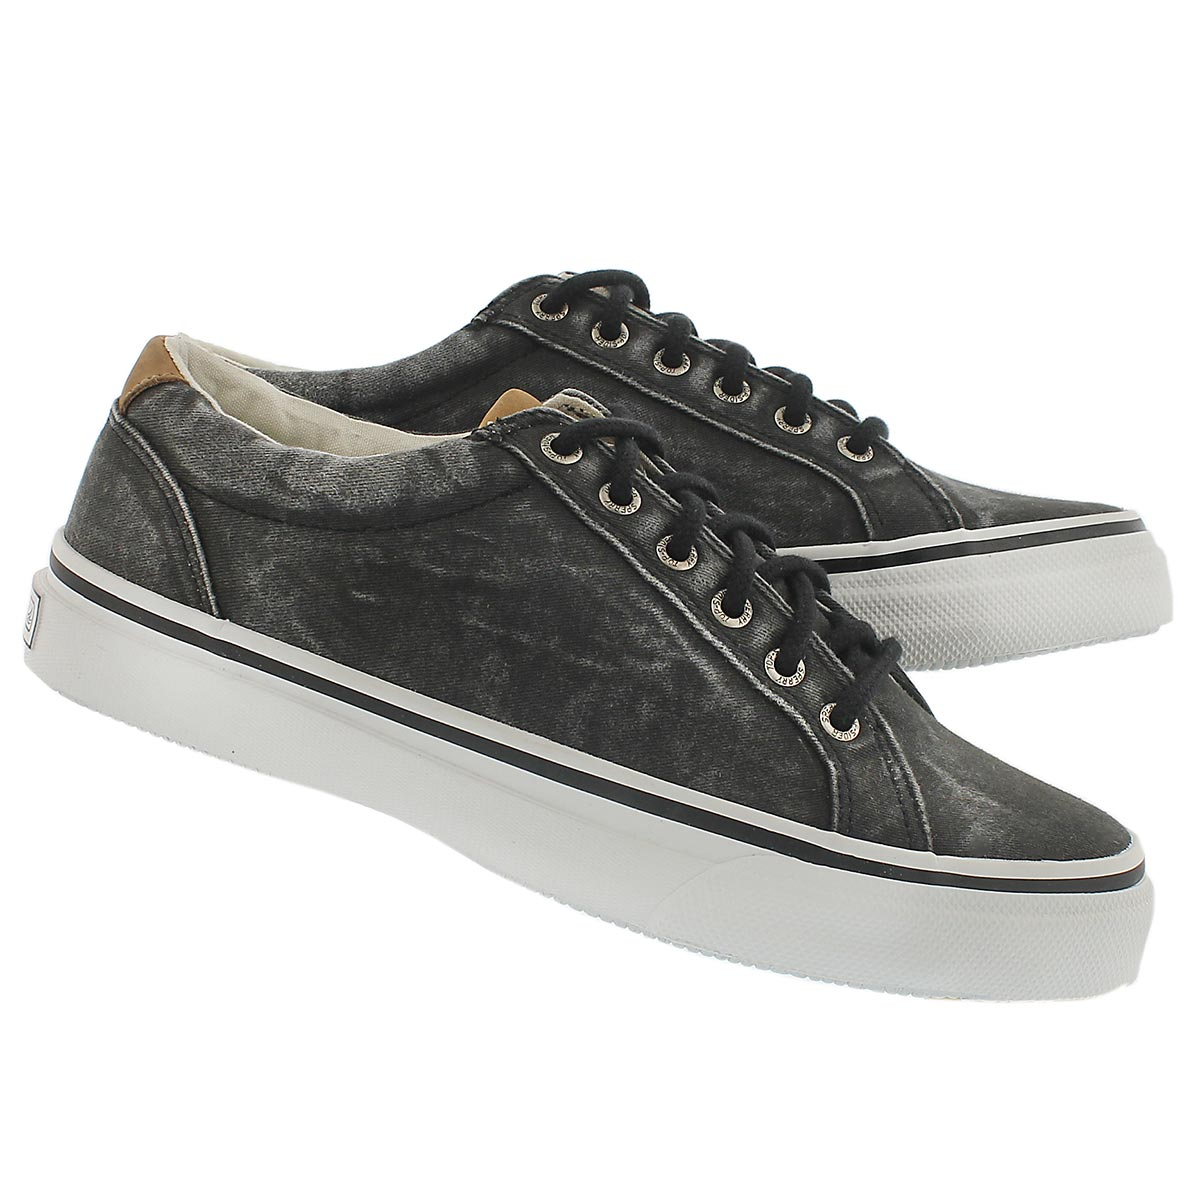 Mns Striper LTT black lace up sneaker